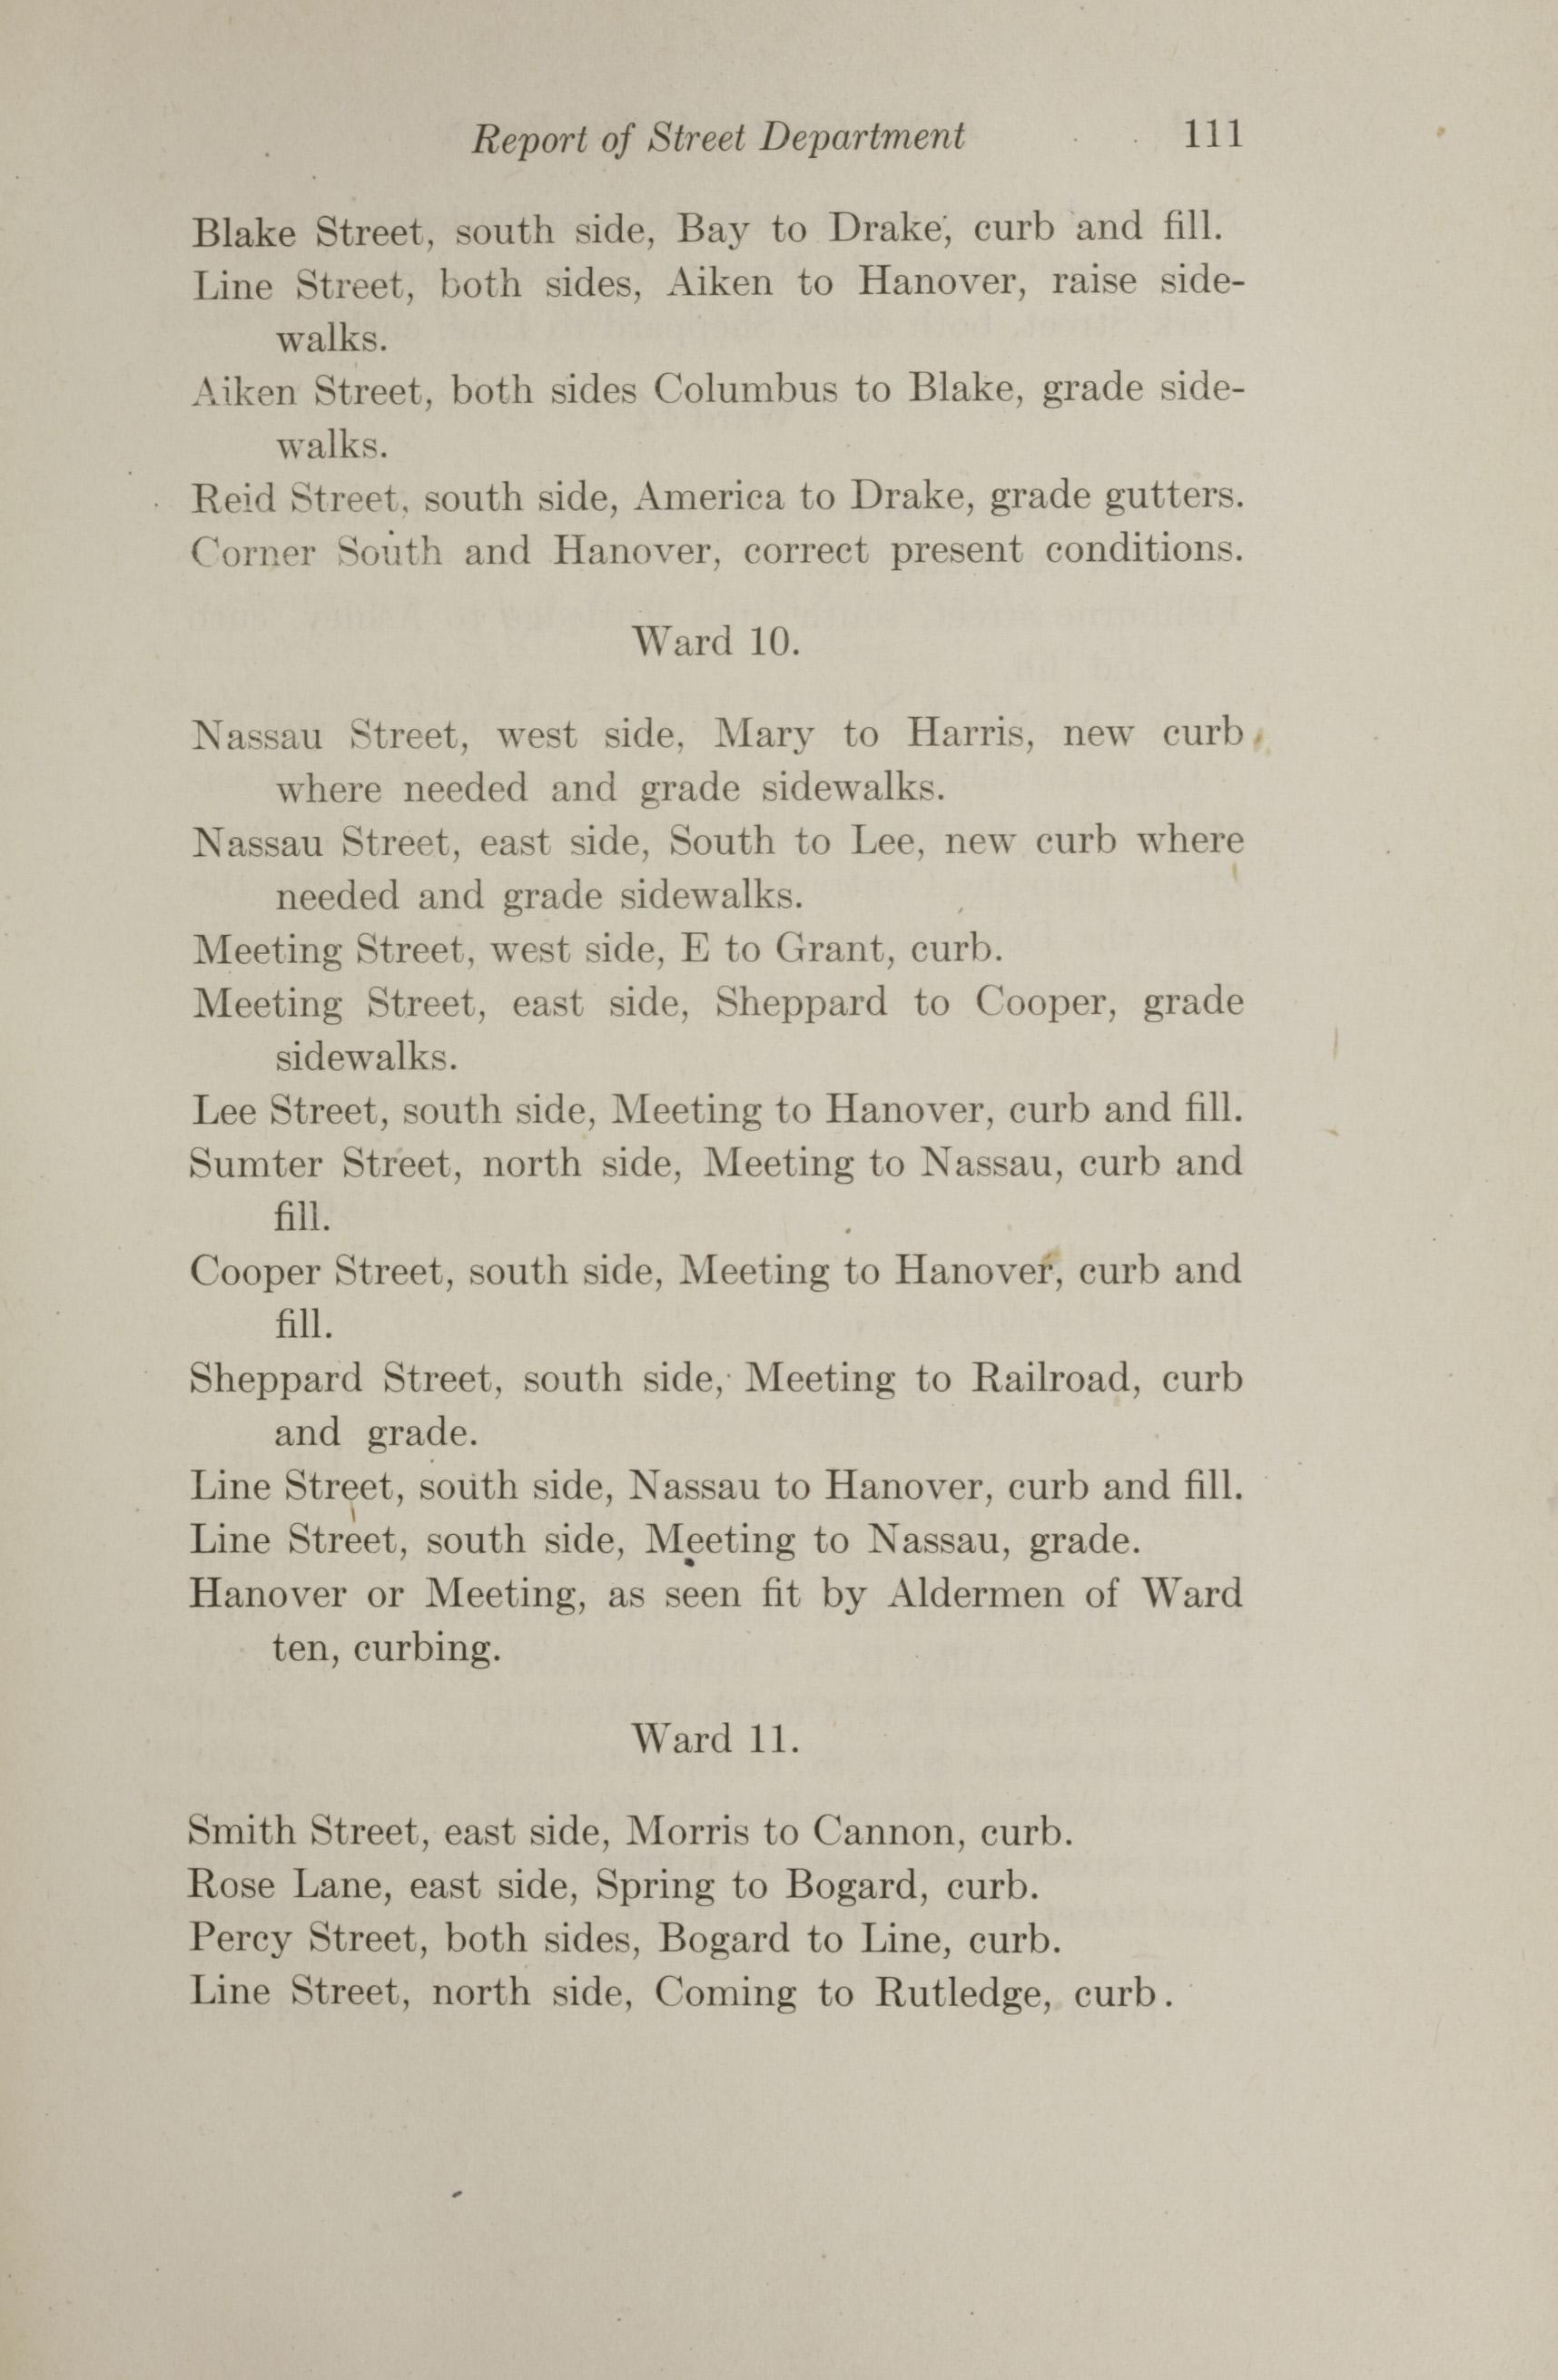 Charleston Yearbook, 1912, page 111